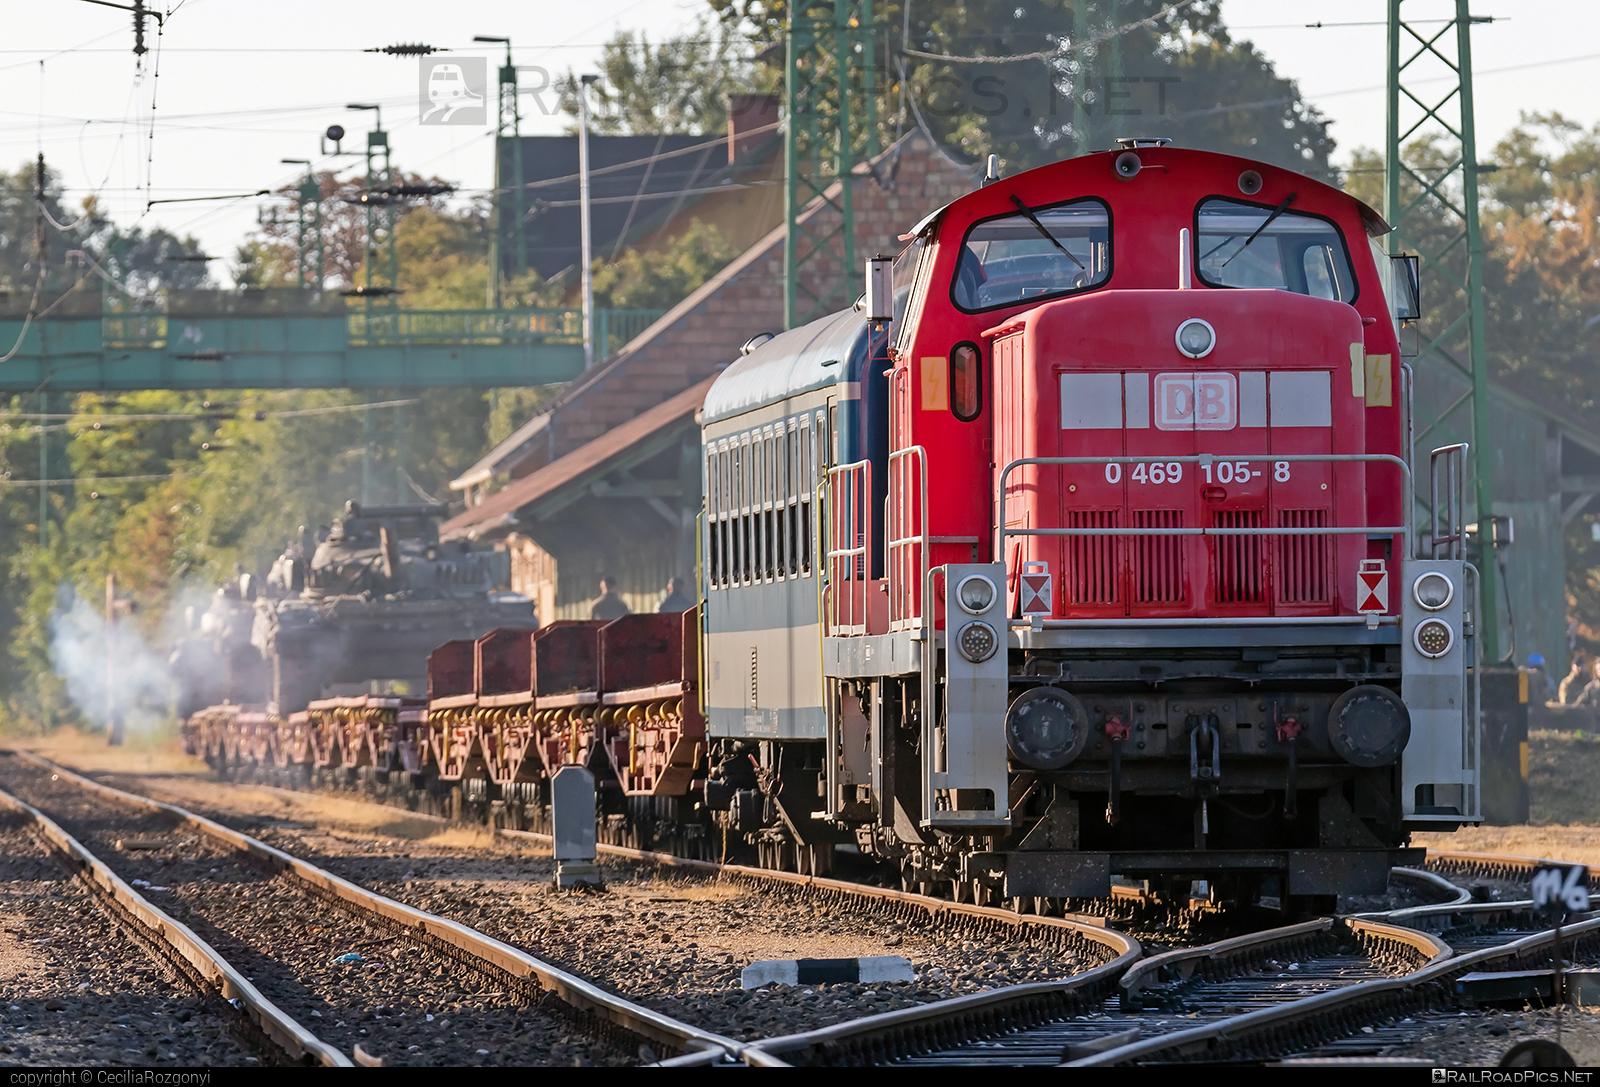 MaK V 90 - 0469 105-8 operated by DB Cargo Hungária Kft #db #dbcargo #dbcargohungaria #dbclass290 #dbclassv90 #mak #makv90 #maschinenbaukiel